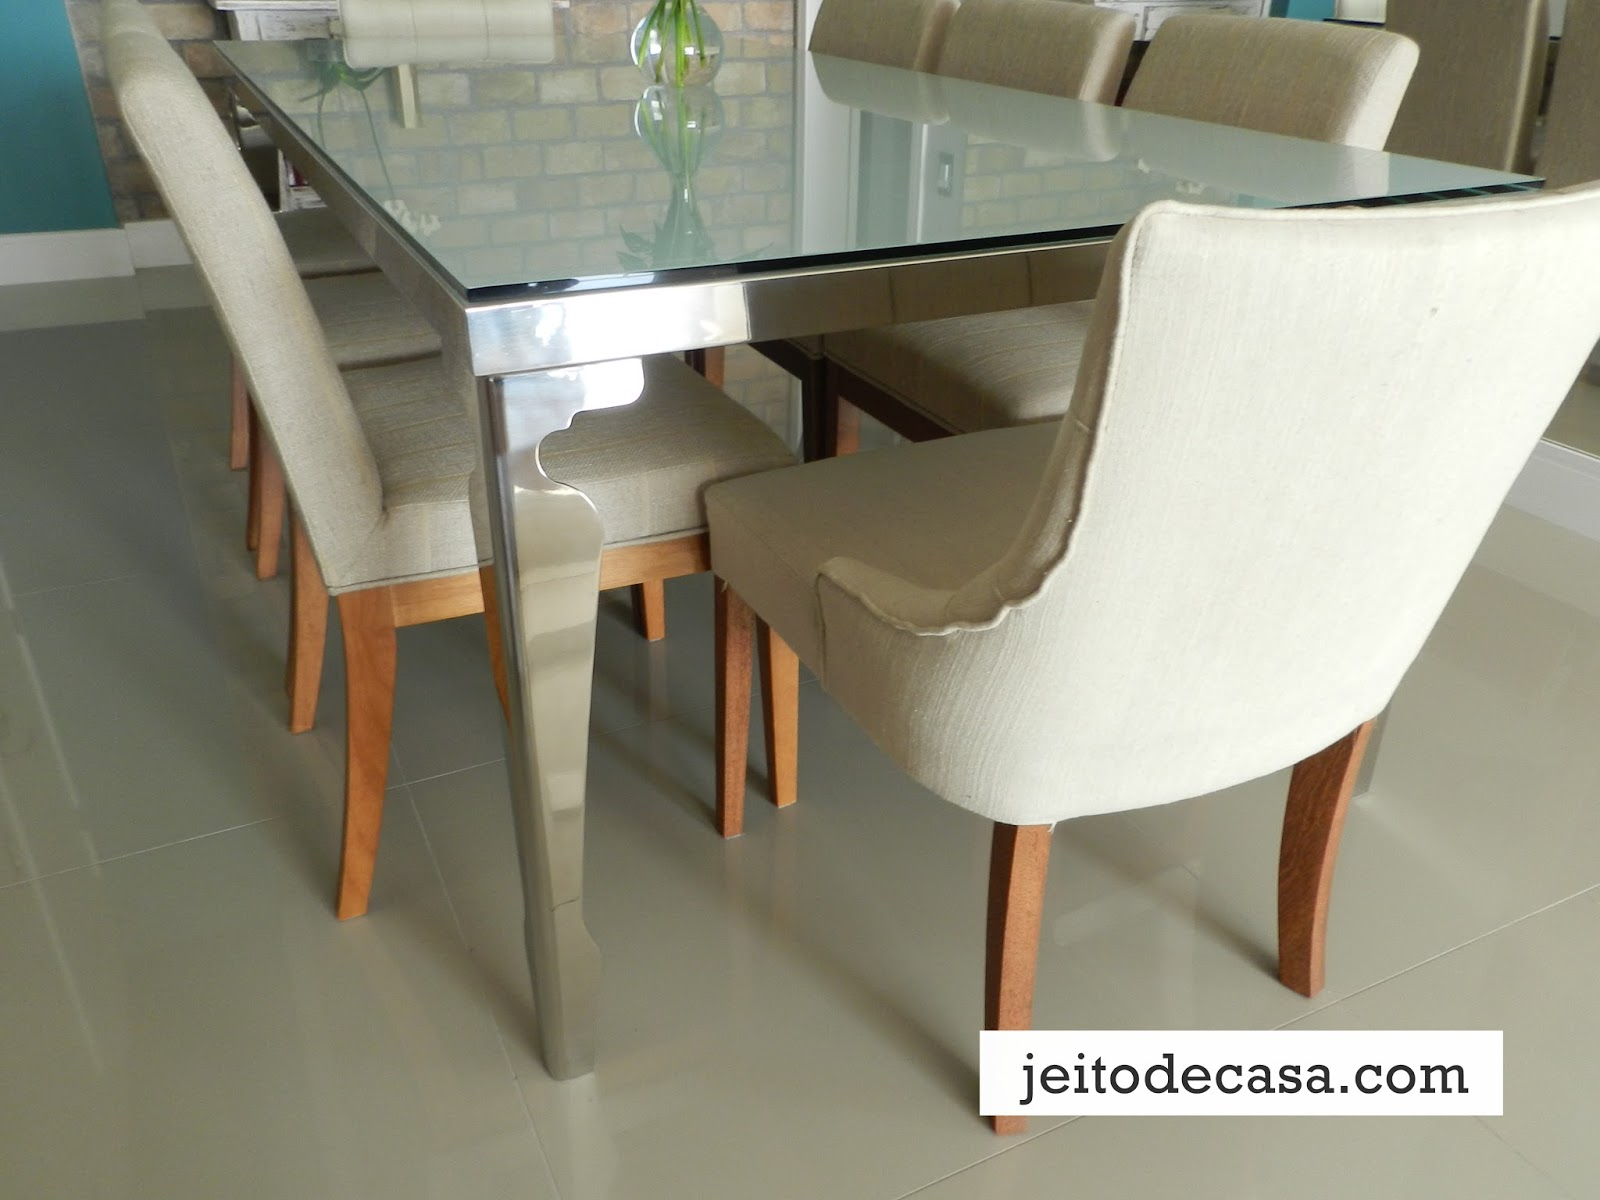 Armario Itatiaia Magazine Luiza ~ Mesa De Jantar 4 Lugares Branca